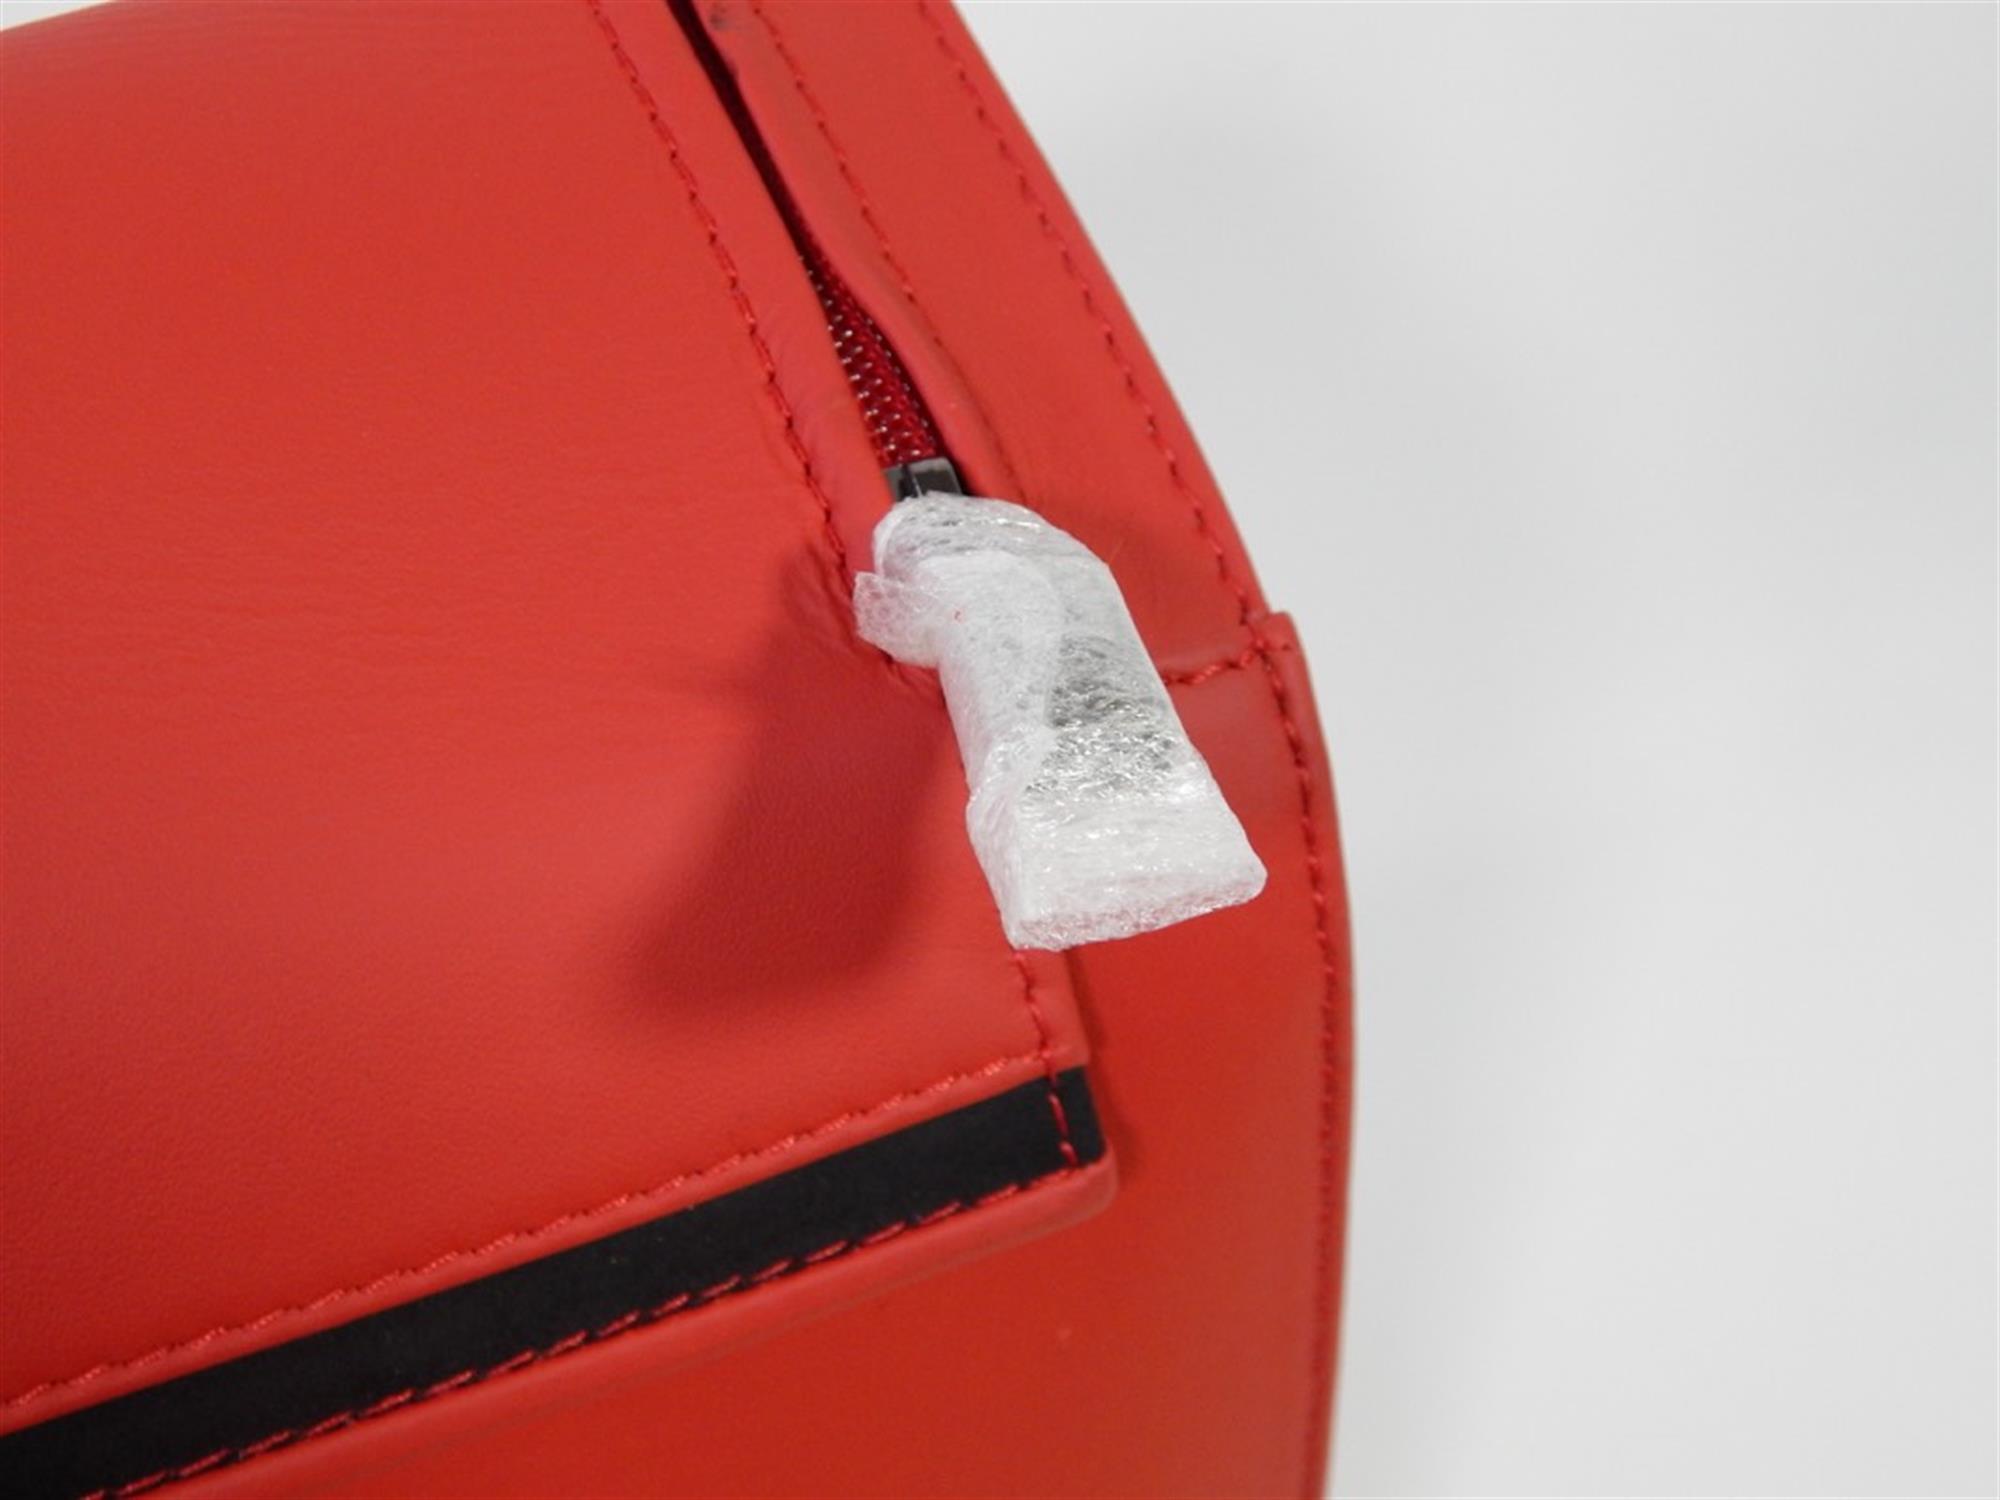 2013 - 2016 Ferrari LaFerrari 2 Piece Complete Schedoni Luggage Set - Image 10 of 10